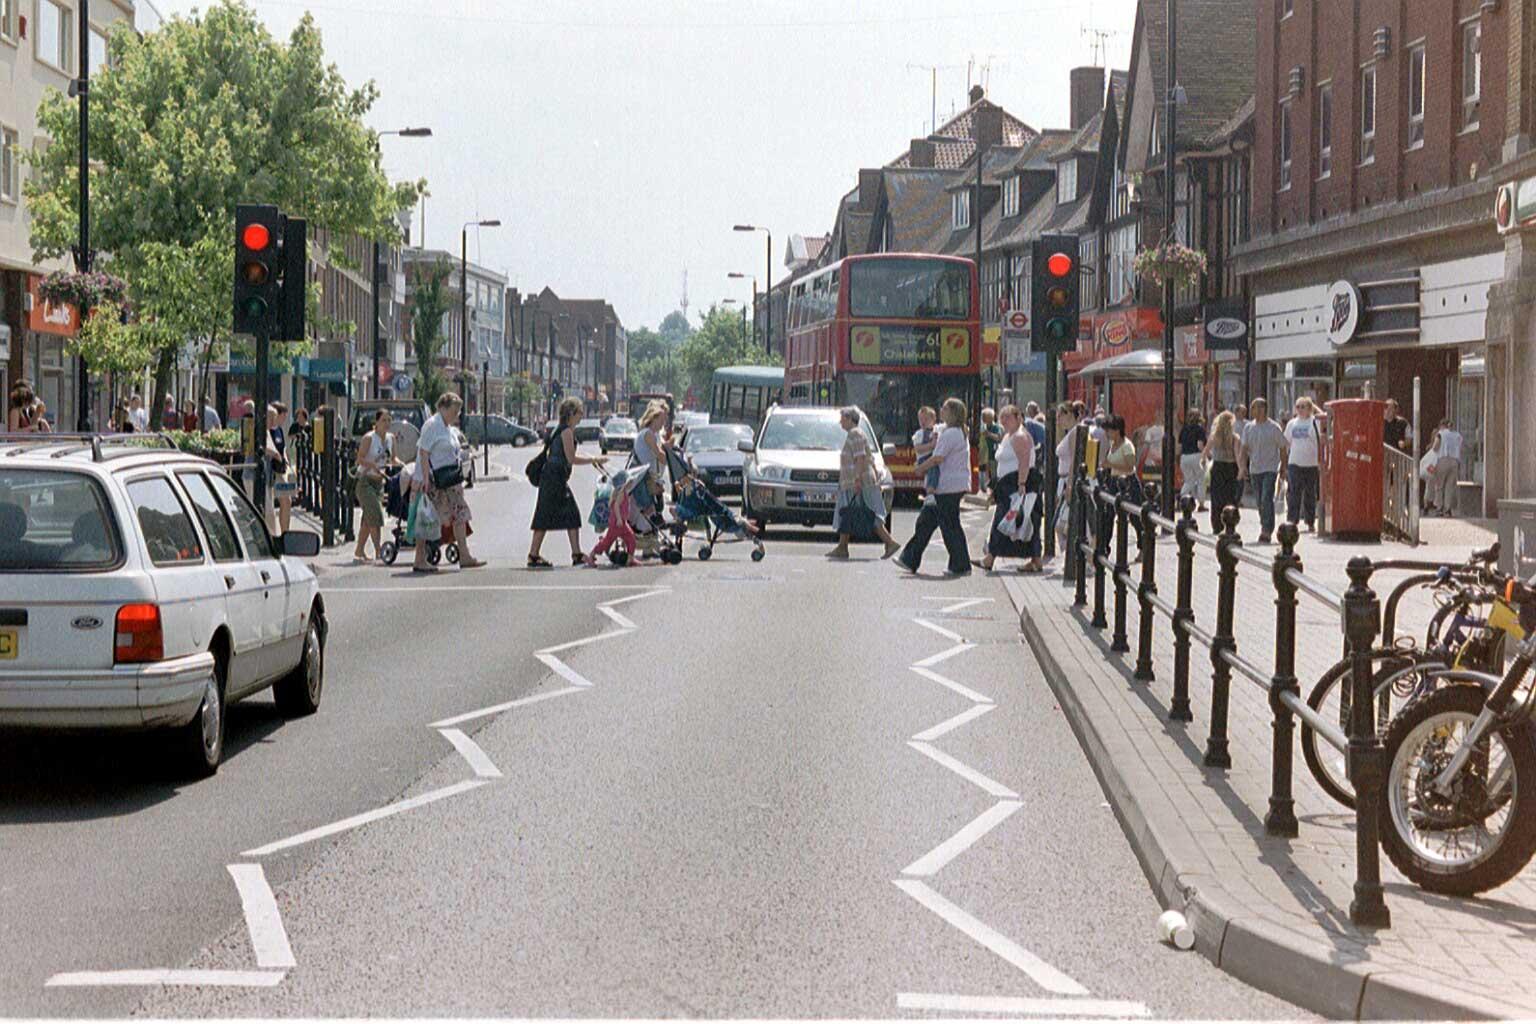 Car Park Chislehurst High Street